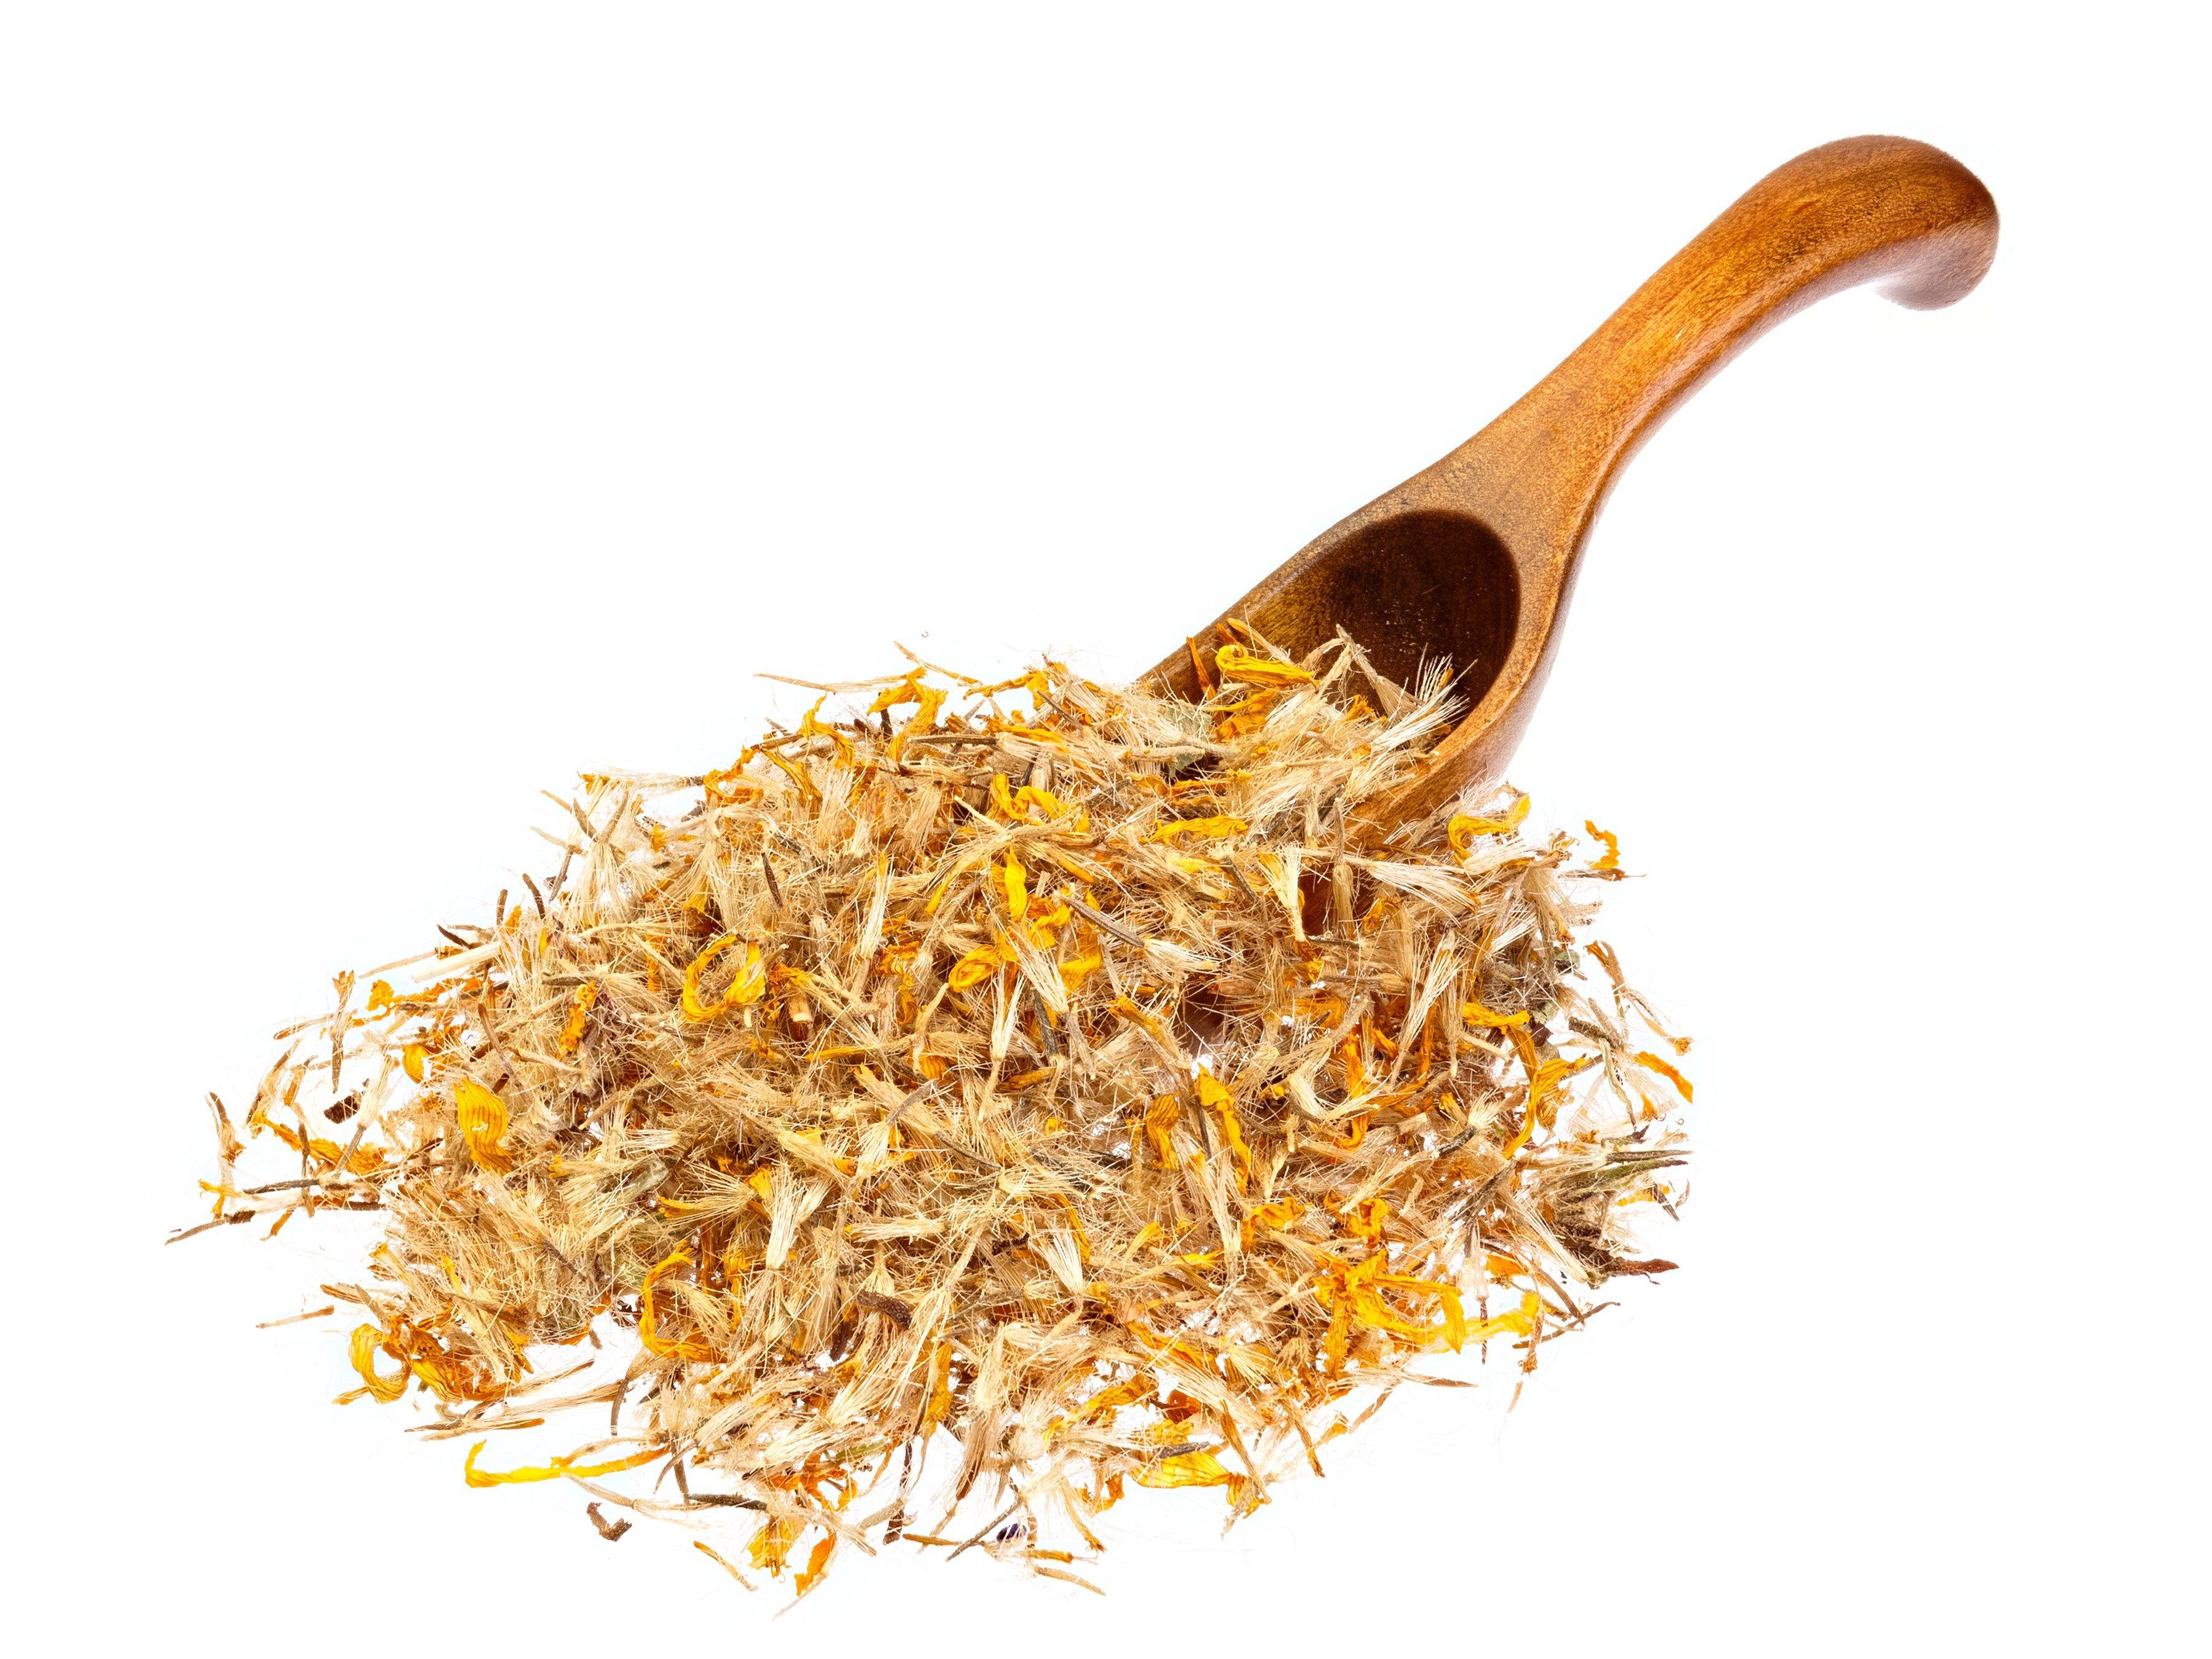 10. Take a homeopathic remedy.